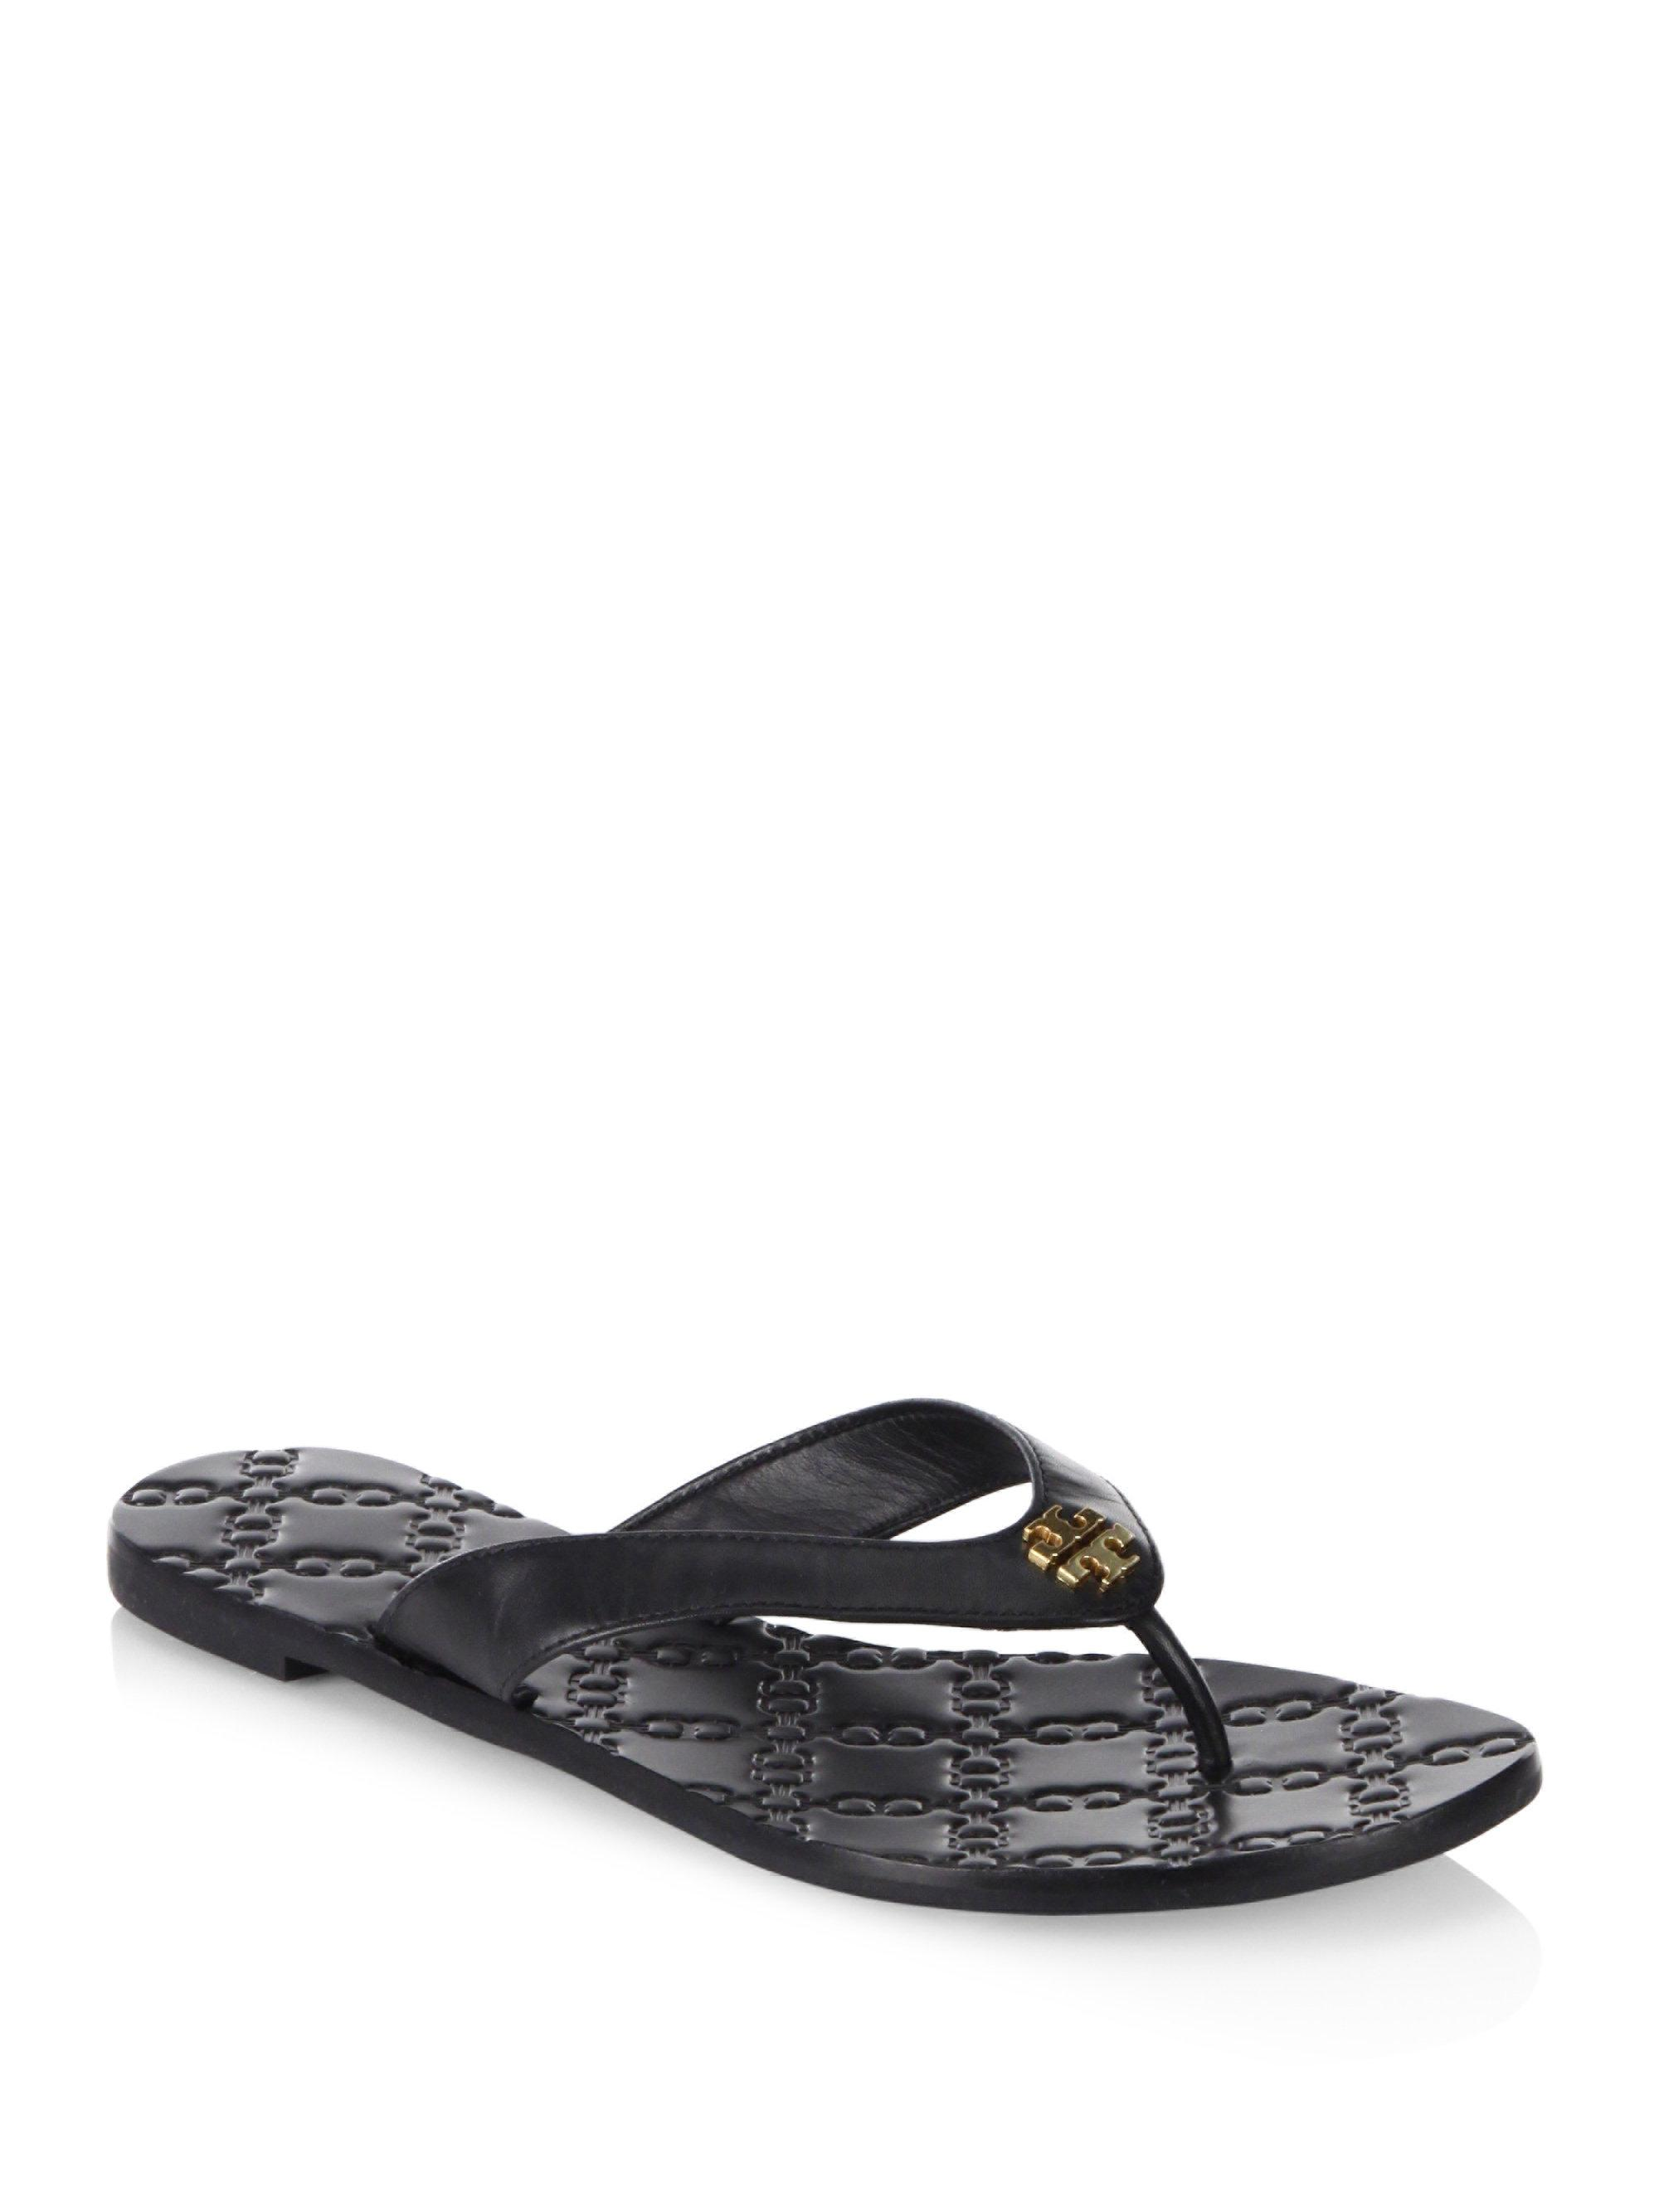 Tory Burch Monroe Leather Thong Sandals se5tG